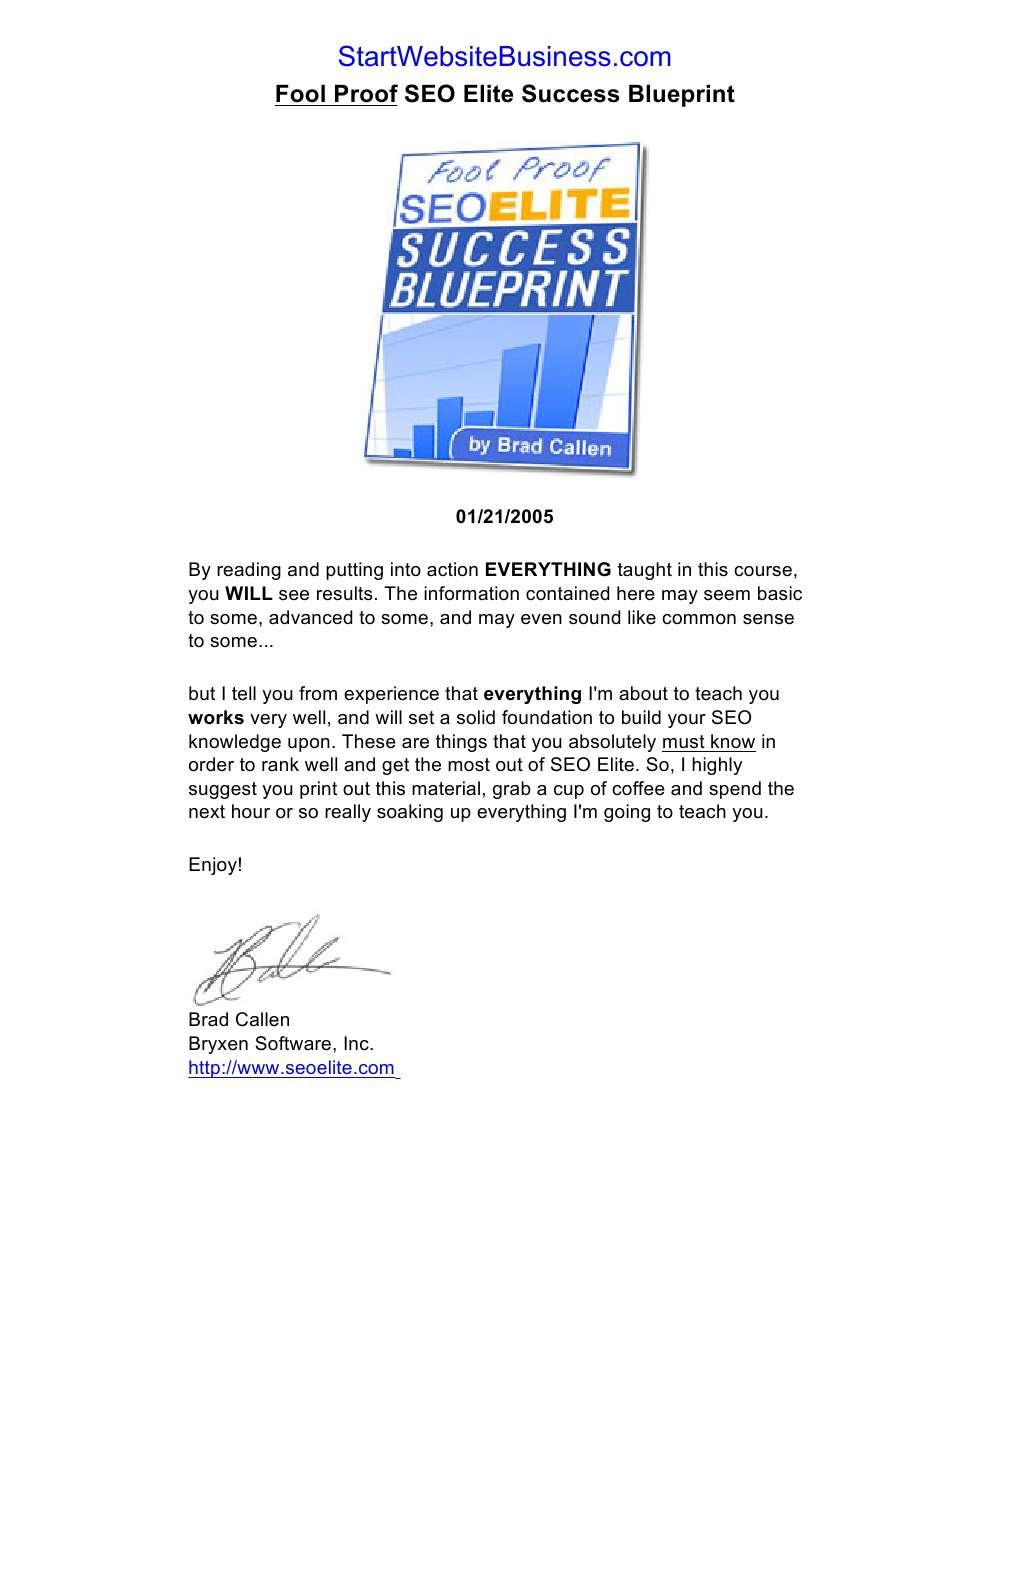 Seo Elite Fool Proof Guide Download Ebook 8freebooks